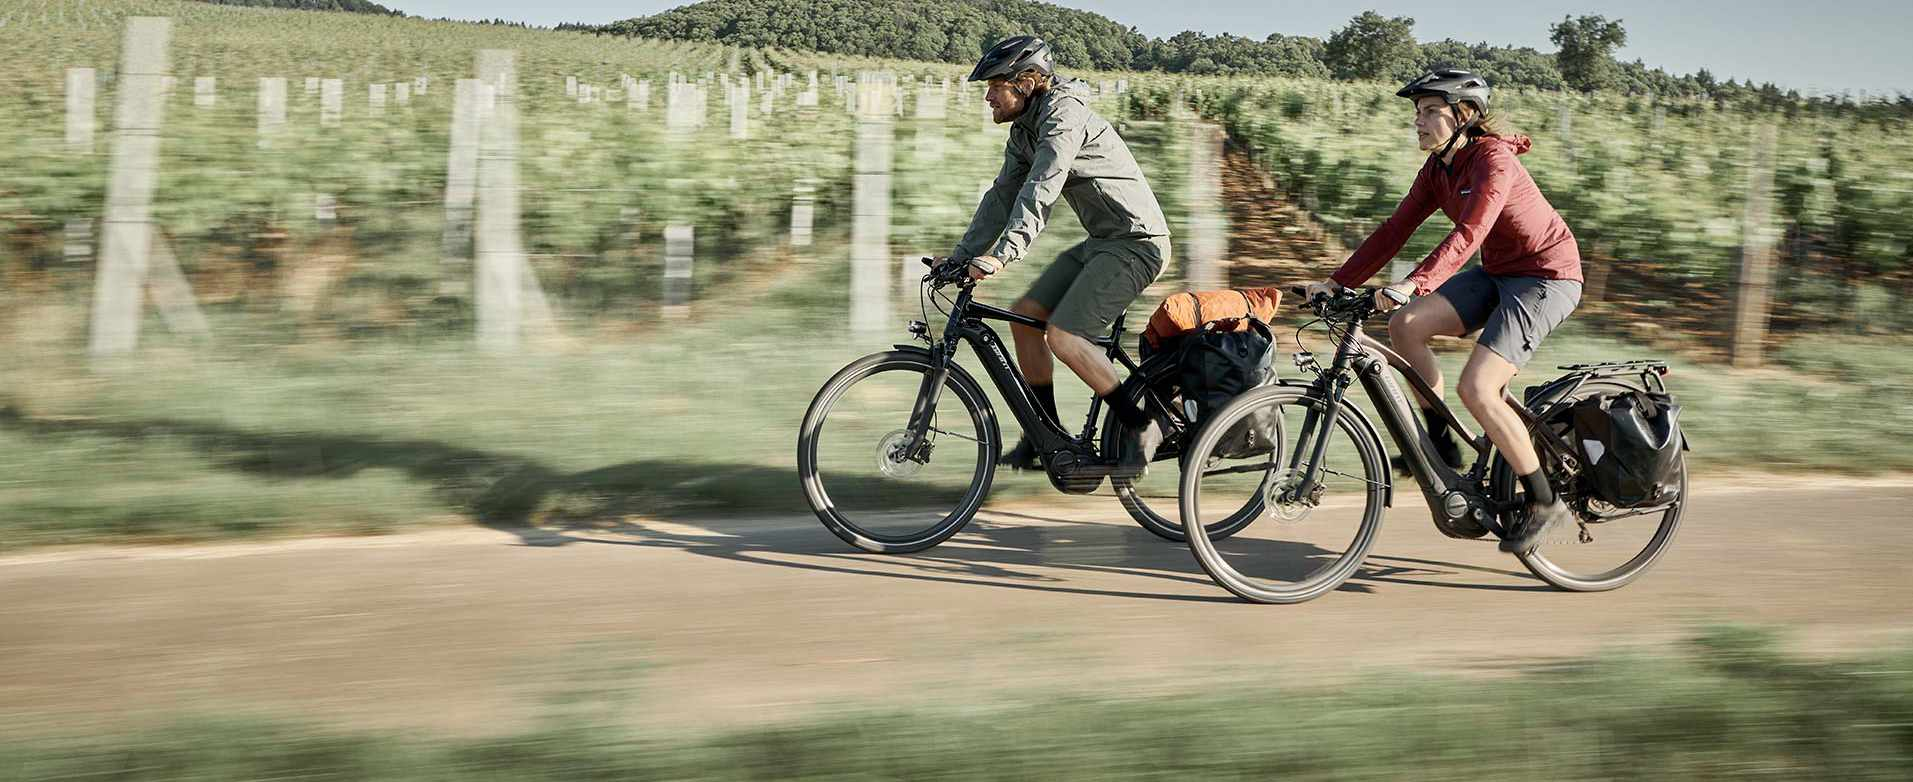 GIANT EXPLORE E Trekking E-Bike